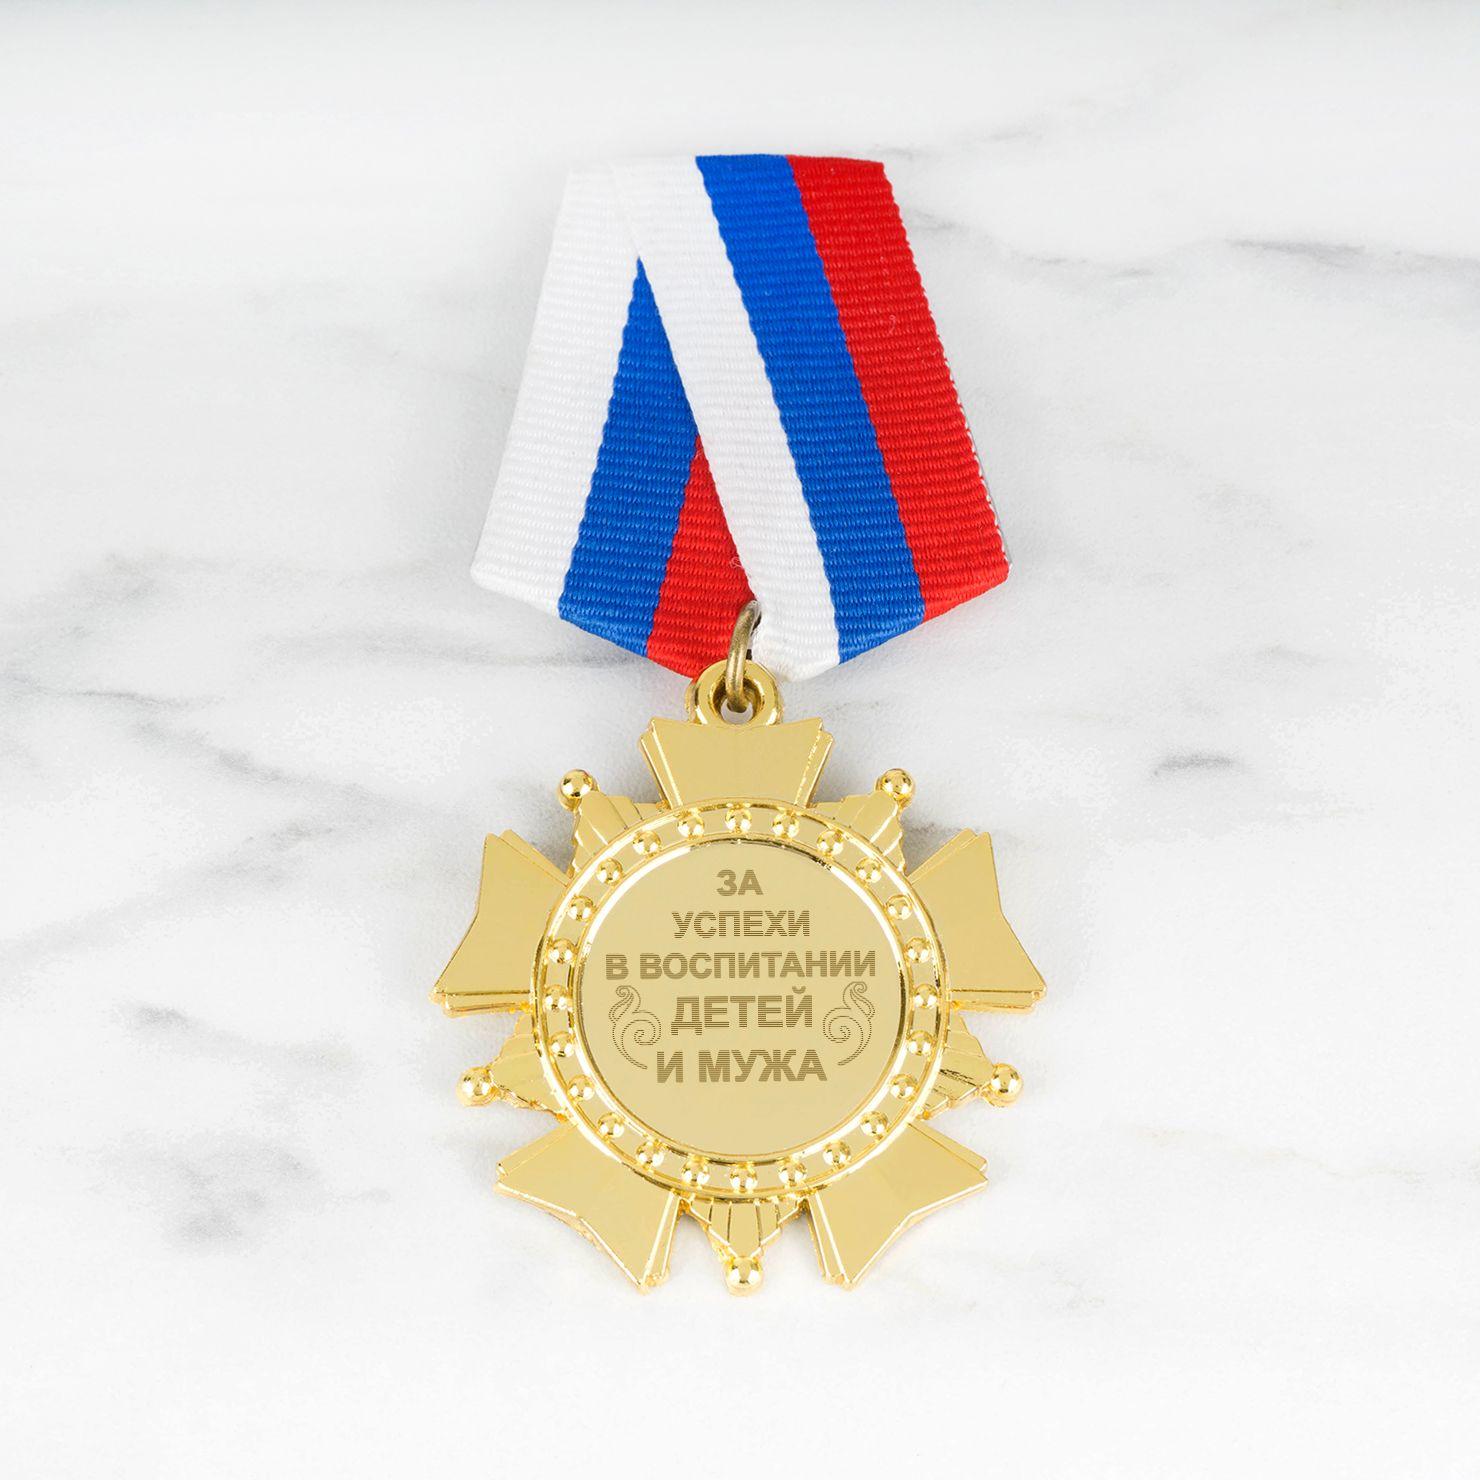 Орден *За успехи в воспитании детей и мужа*